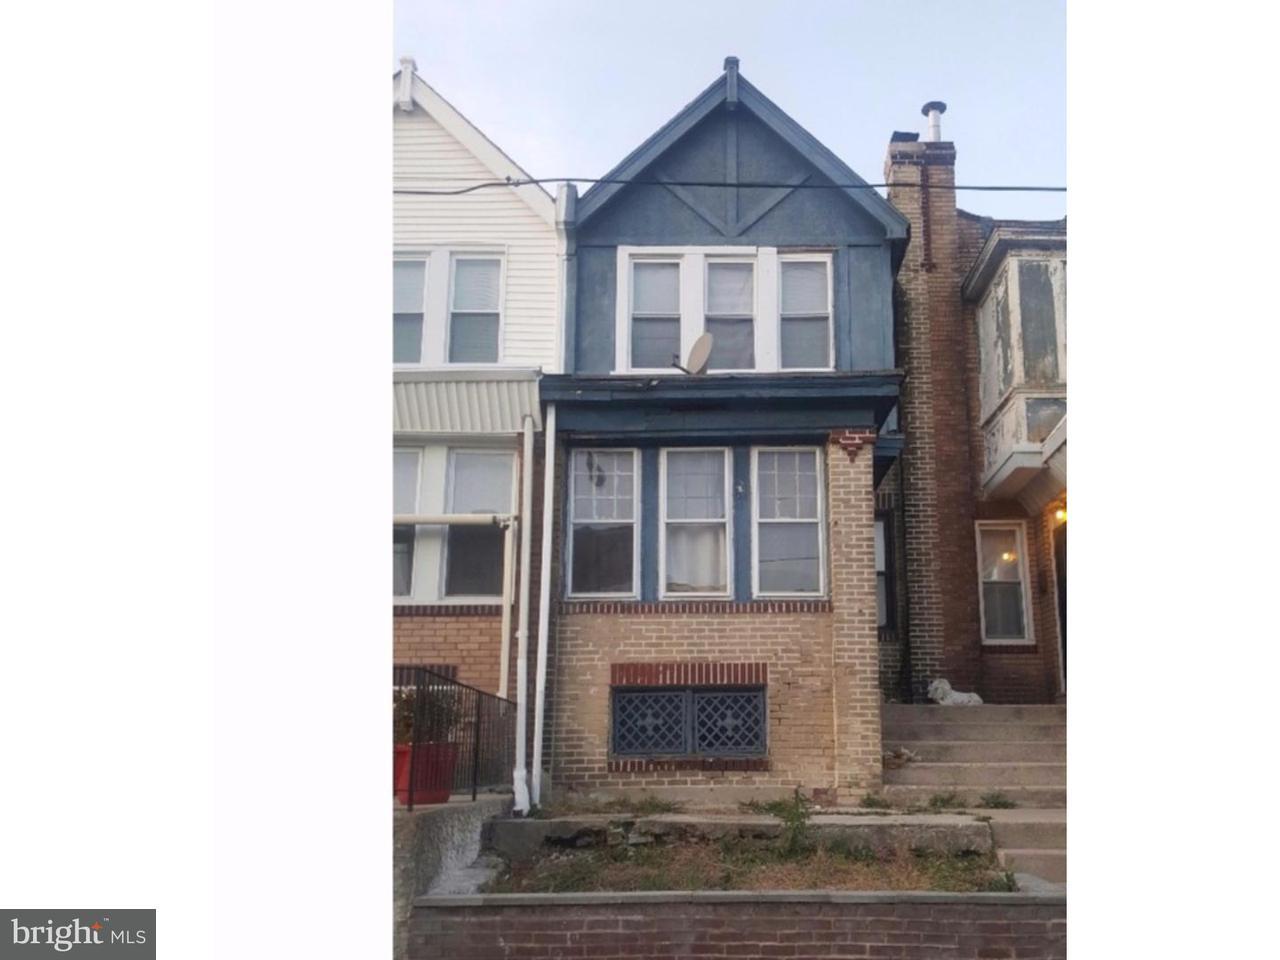 5235  Euclid Philadelphia, PA 19131